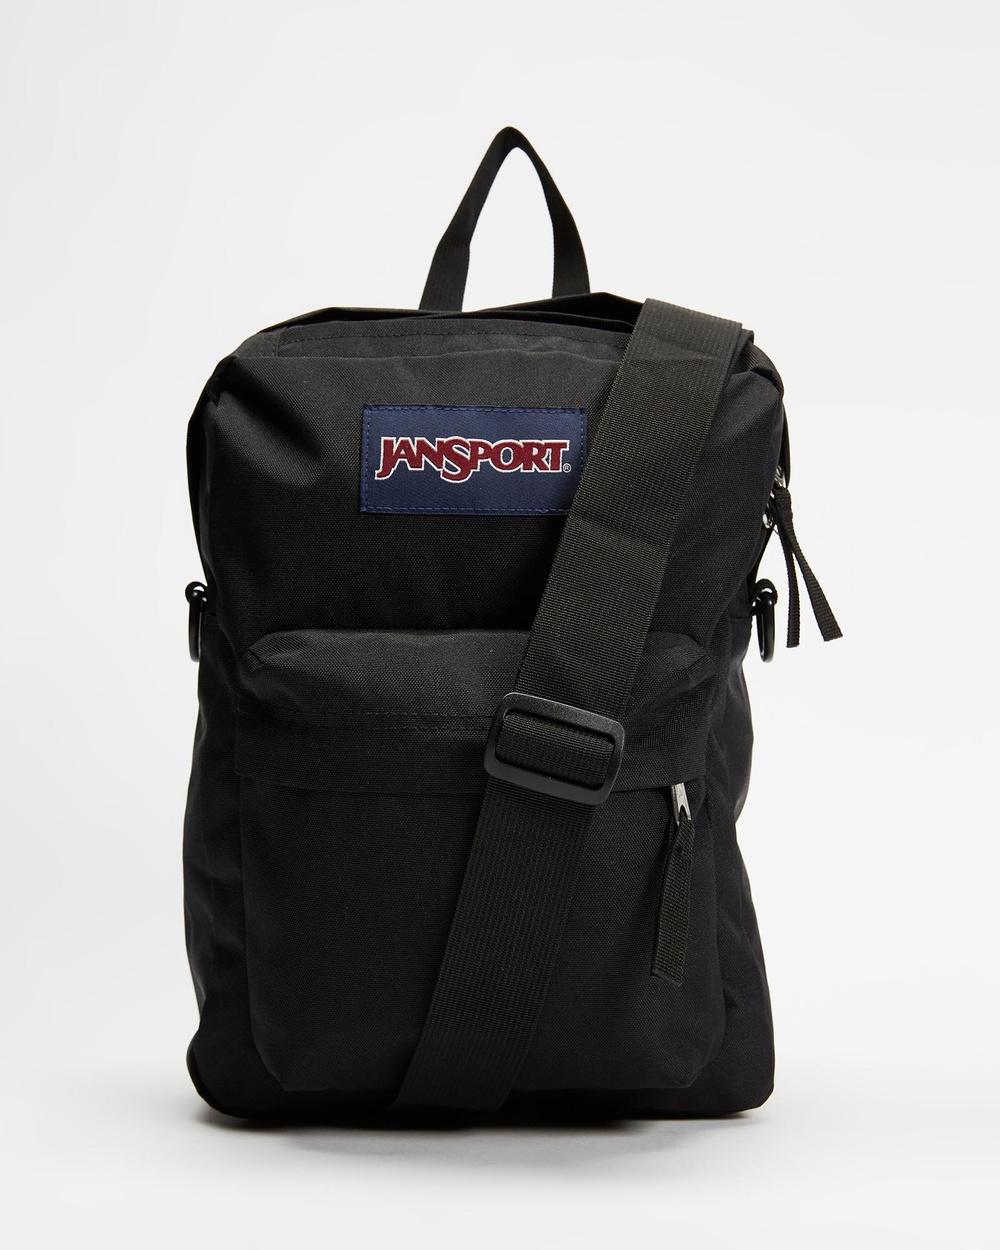 JanSport Colfax Crossbody Bag Bags Black